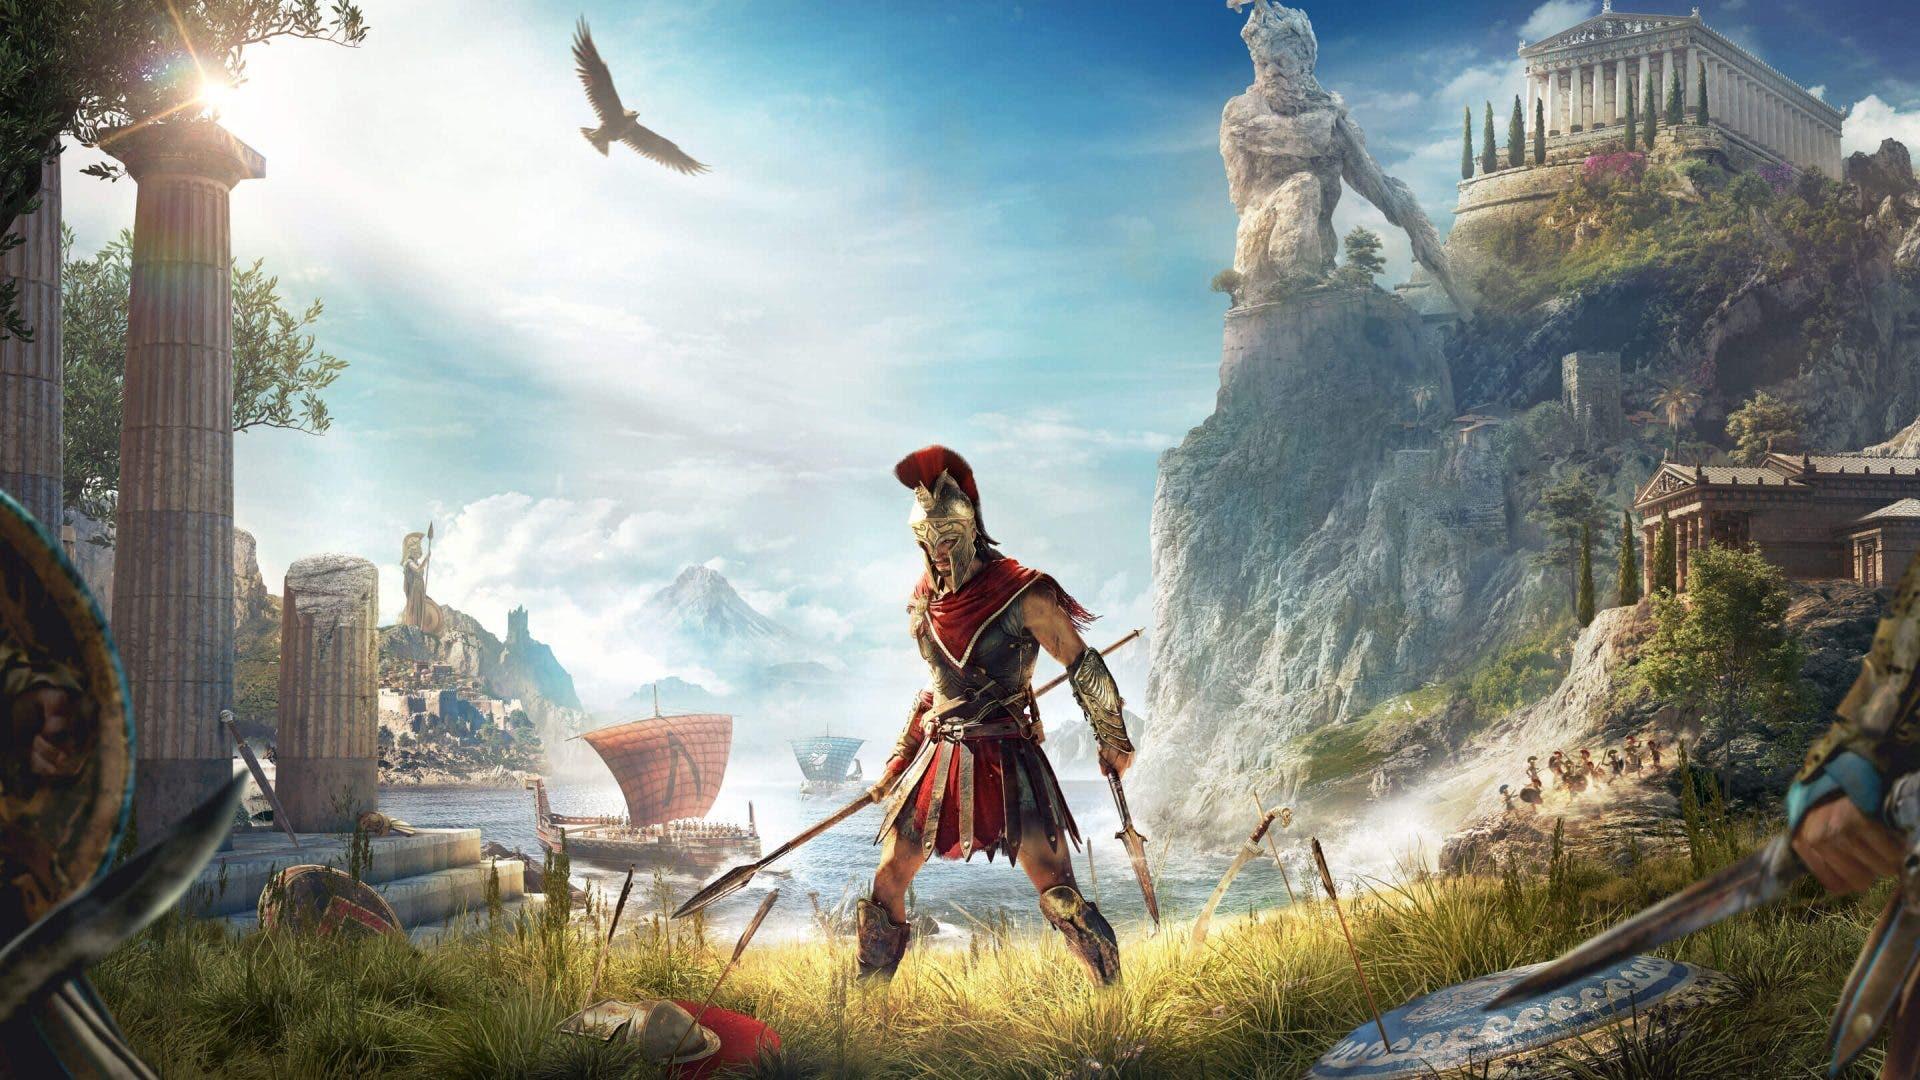 Imagen de Assassin's Creed Odyssey bromea con la polémica de Battlefront 2 en un easter egg